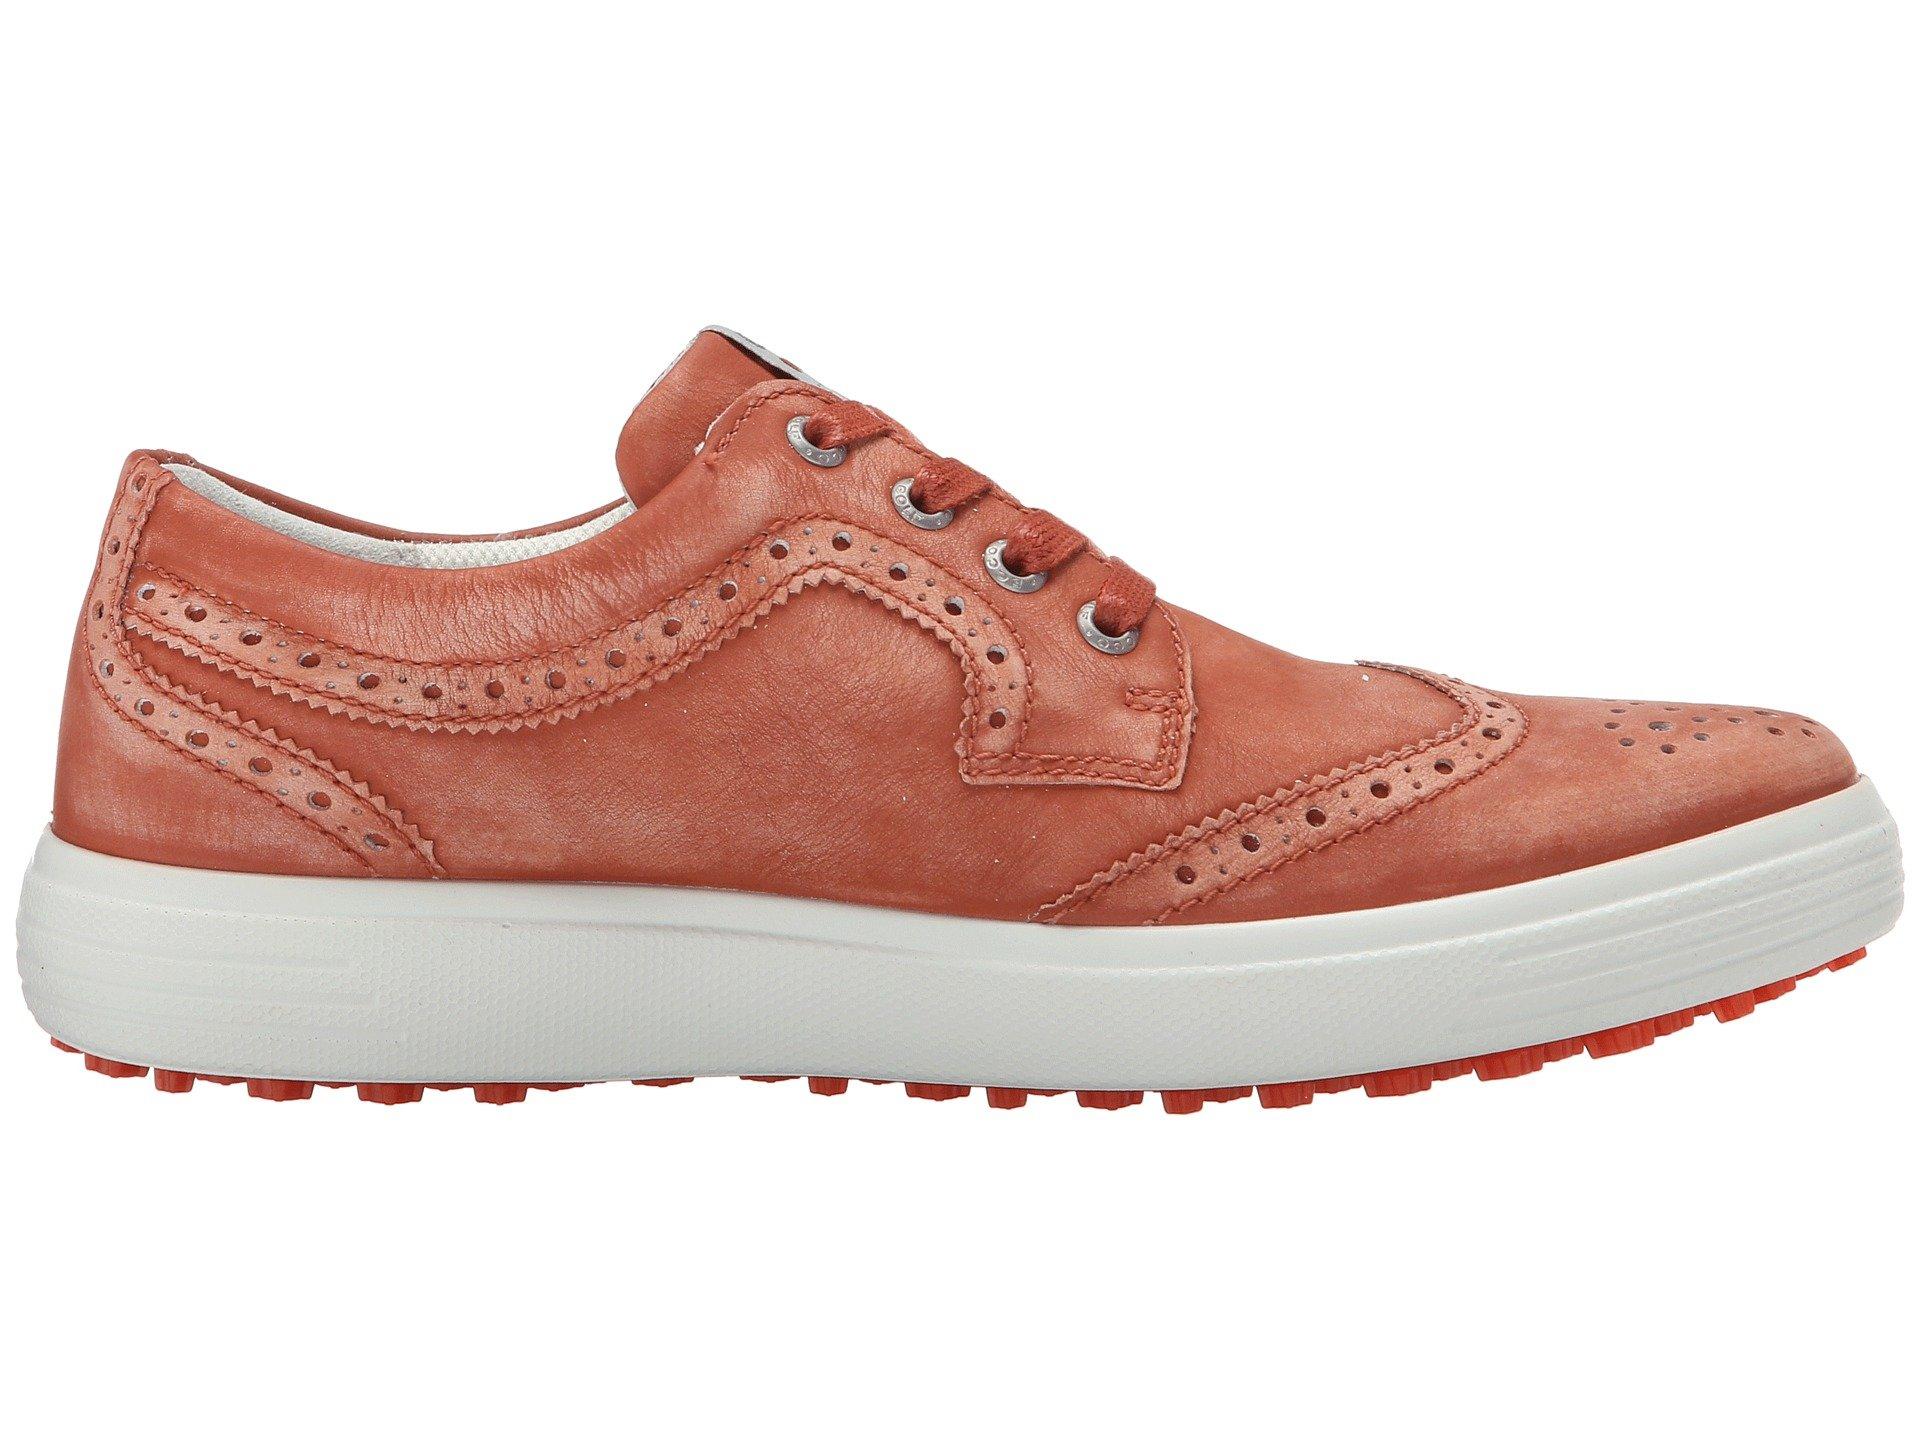 New Ecco Wingtip Golf Shoes